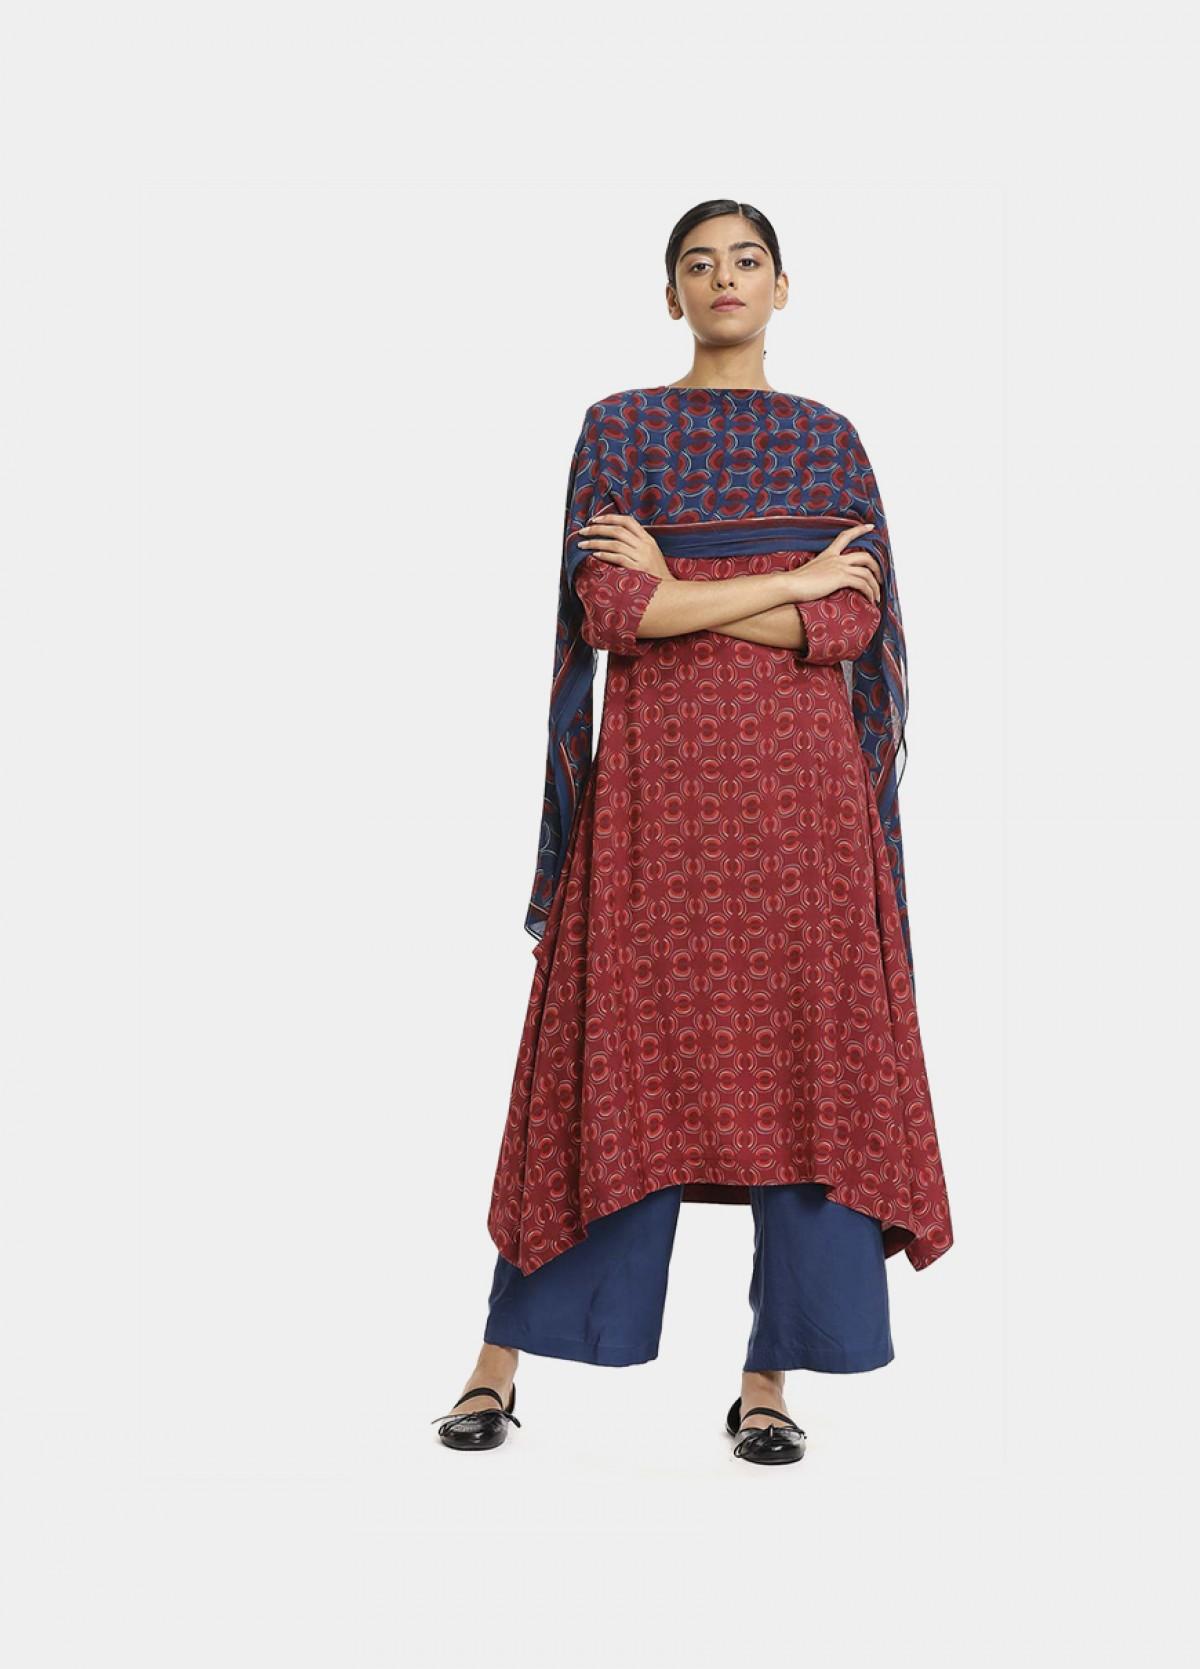 The Boond Red maroon kurta set